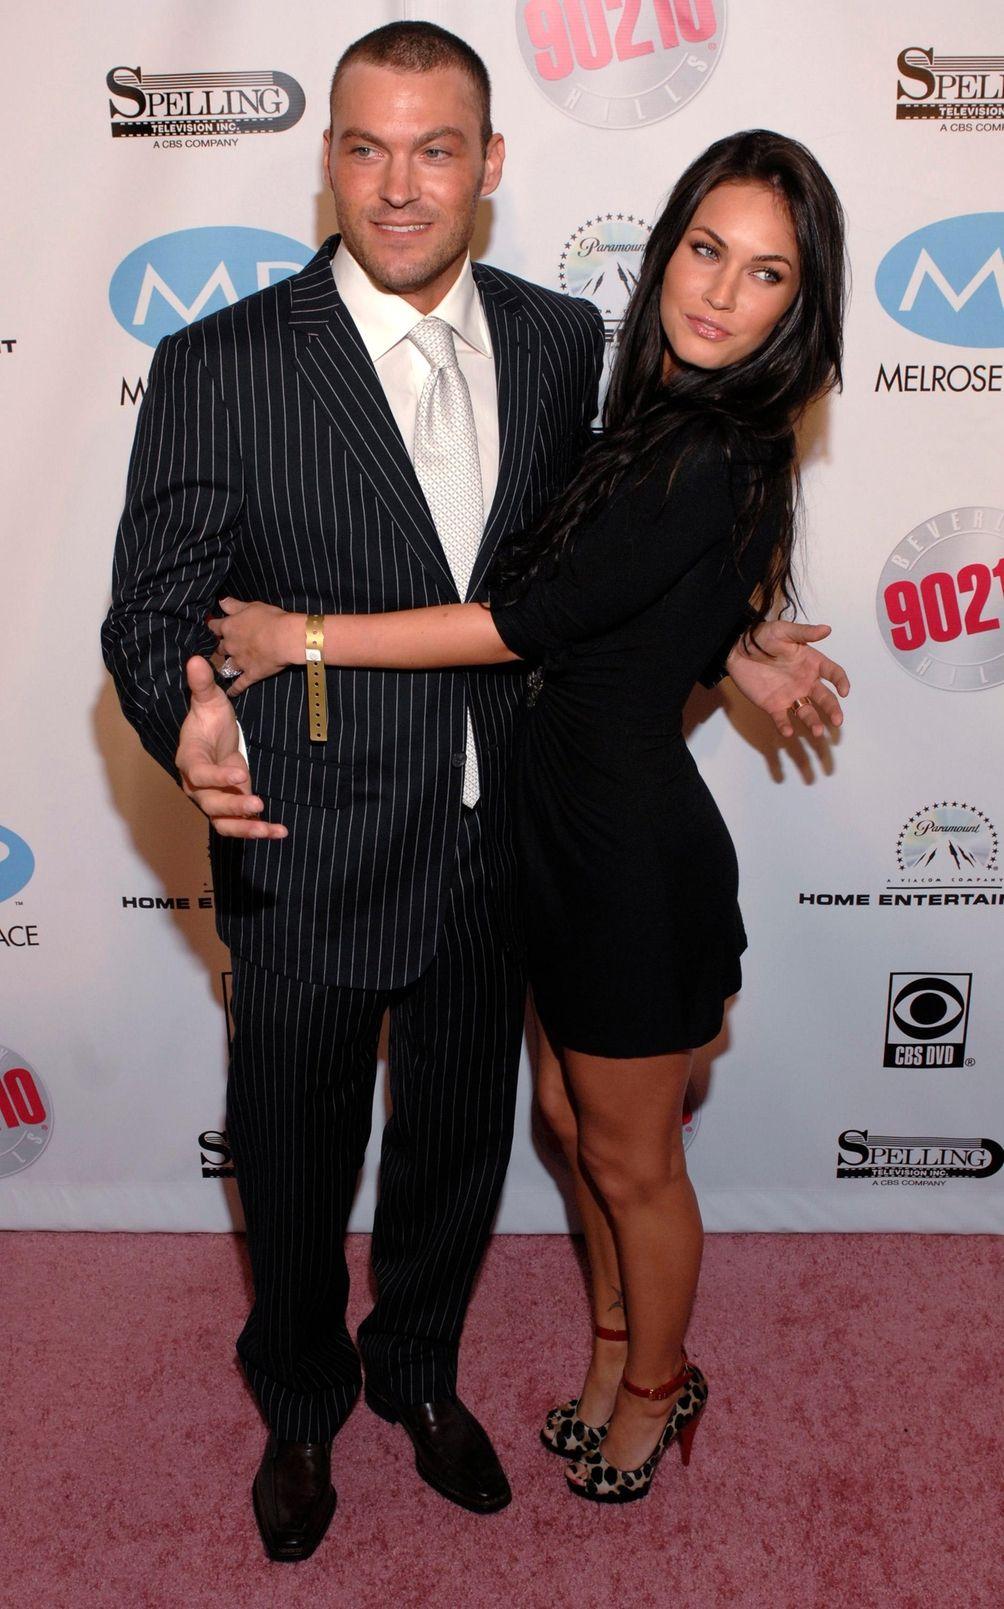 Parents: Megan Fox and Brian Austin Green Children: